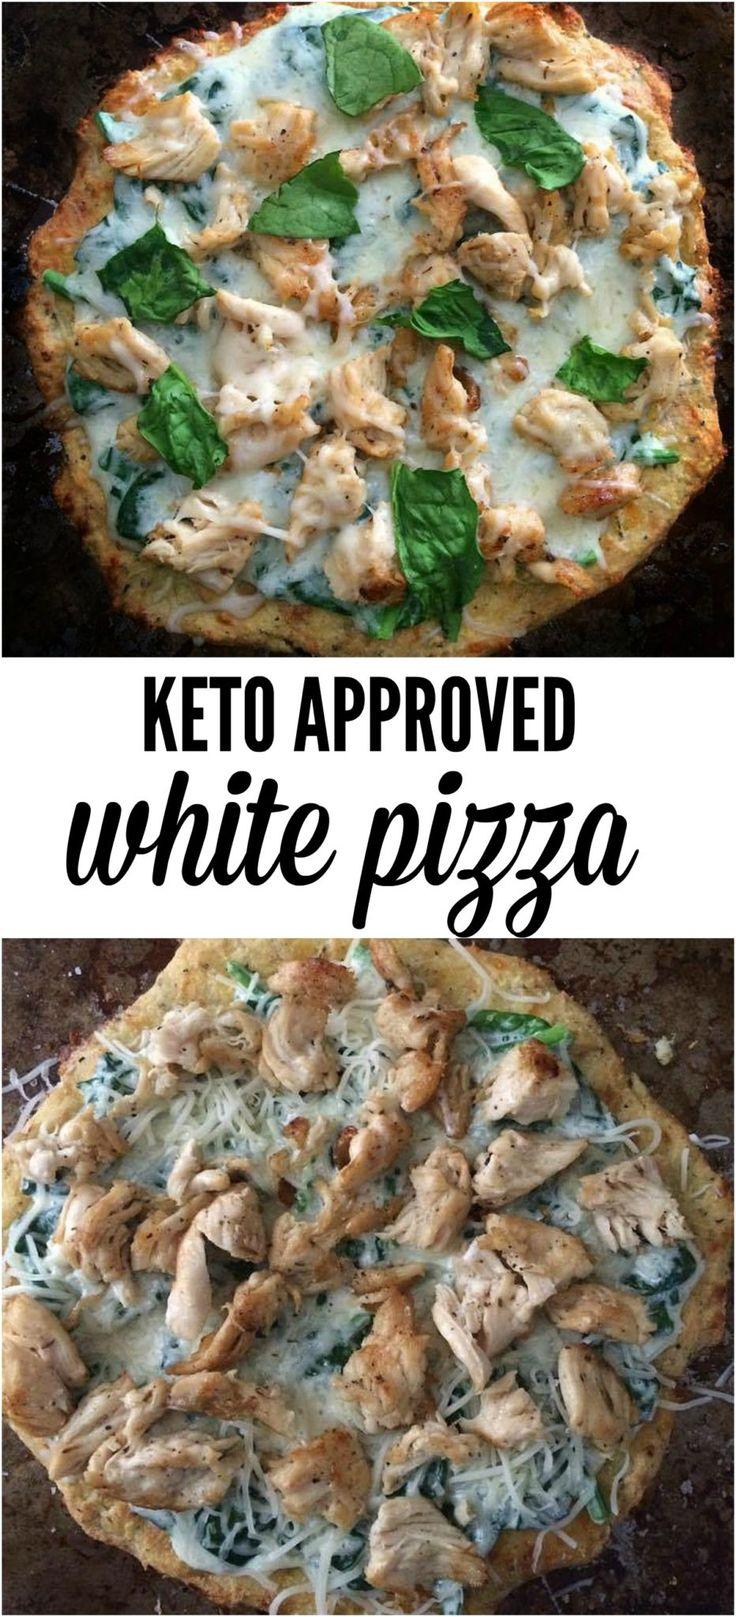 keto pizza - grilled chicken & spinach